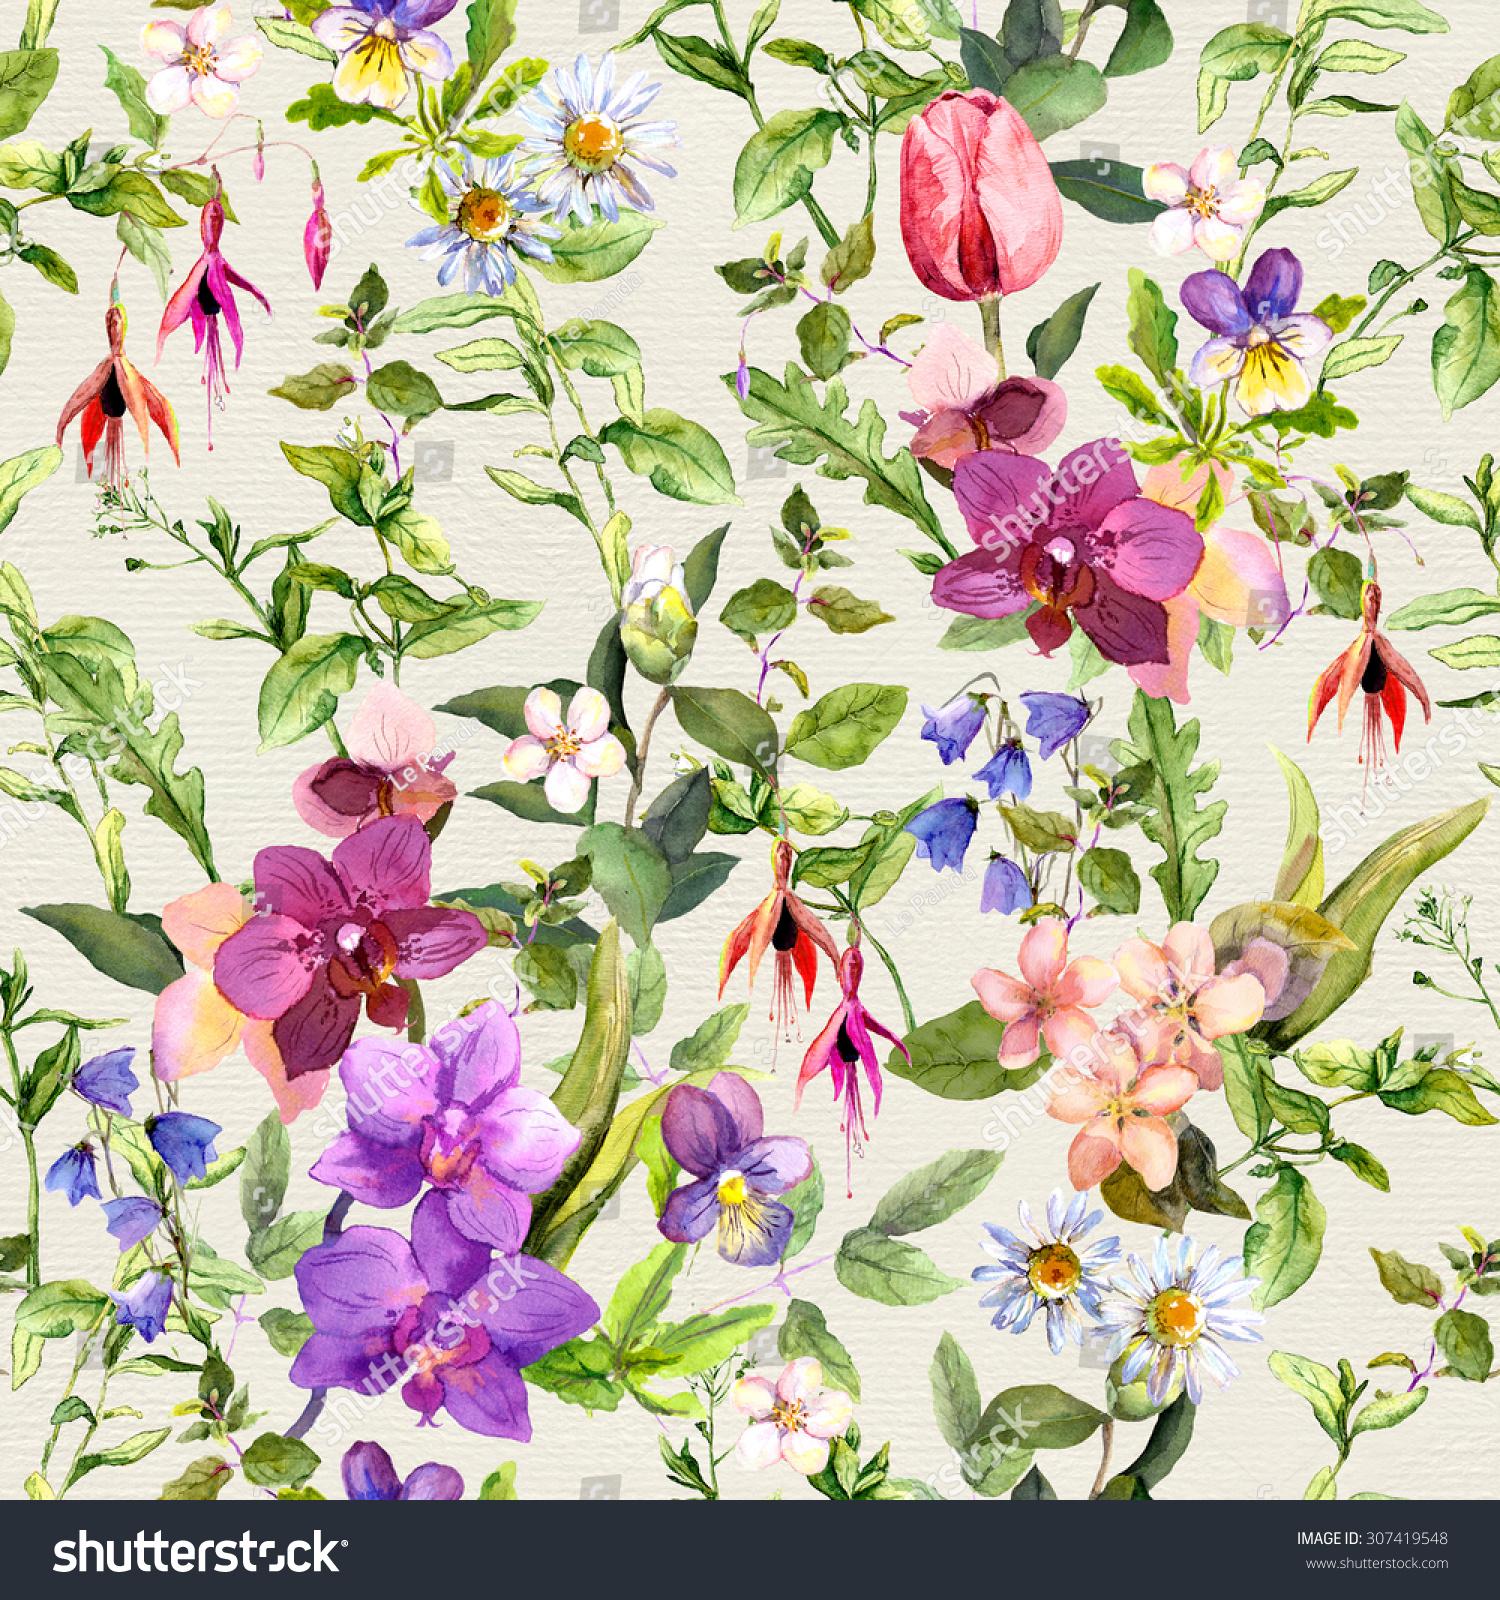 Flowers And Butterflies. Meadow